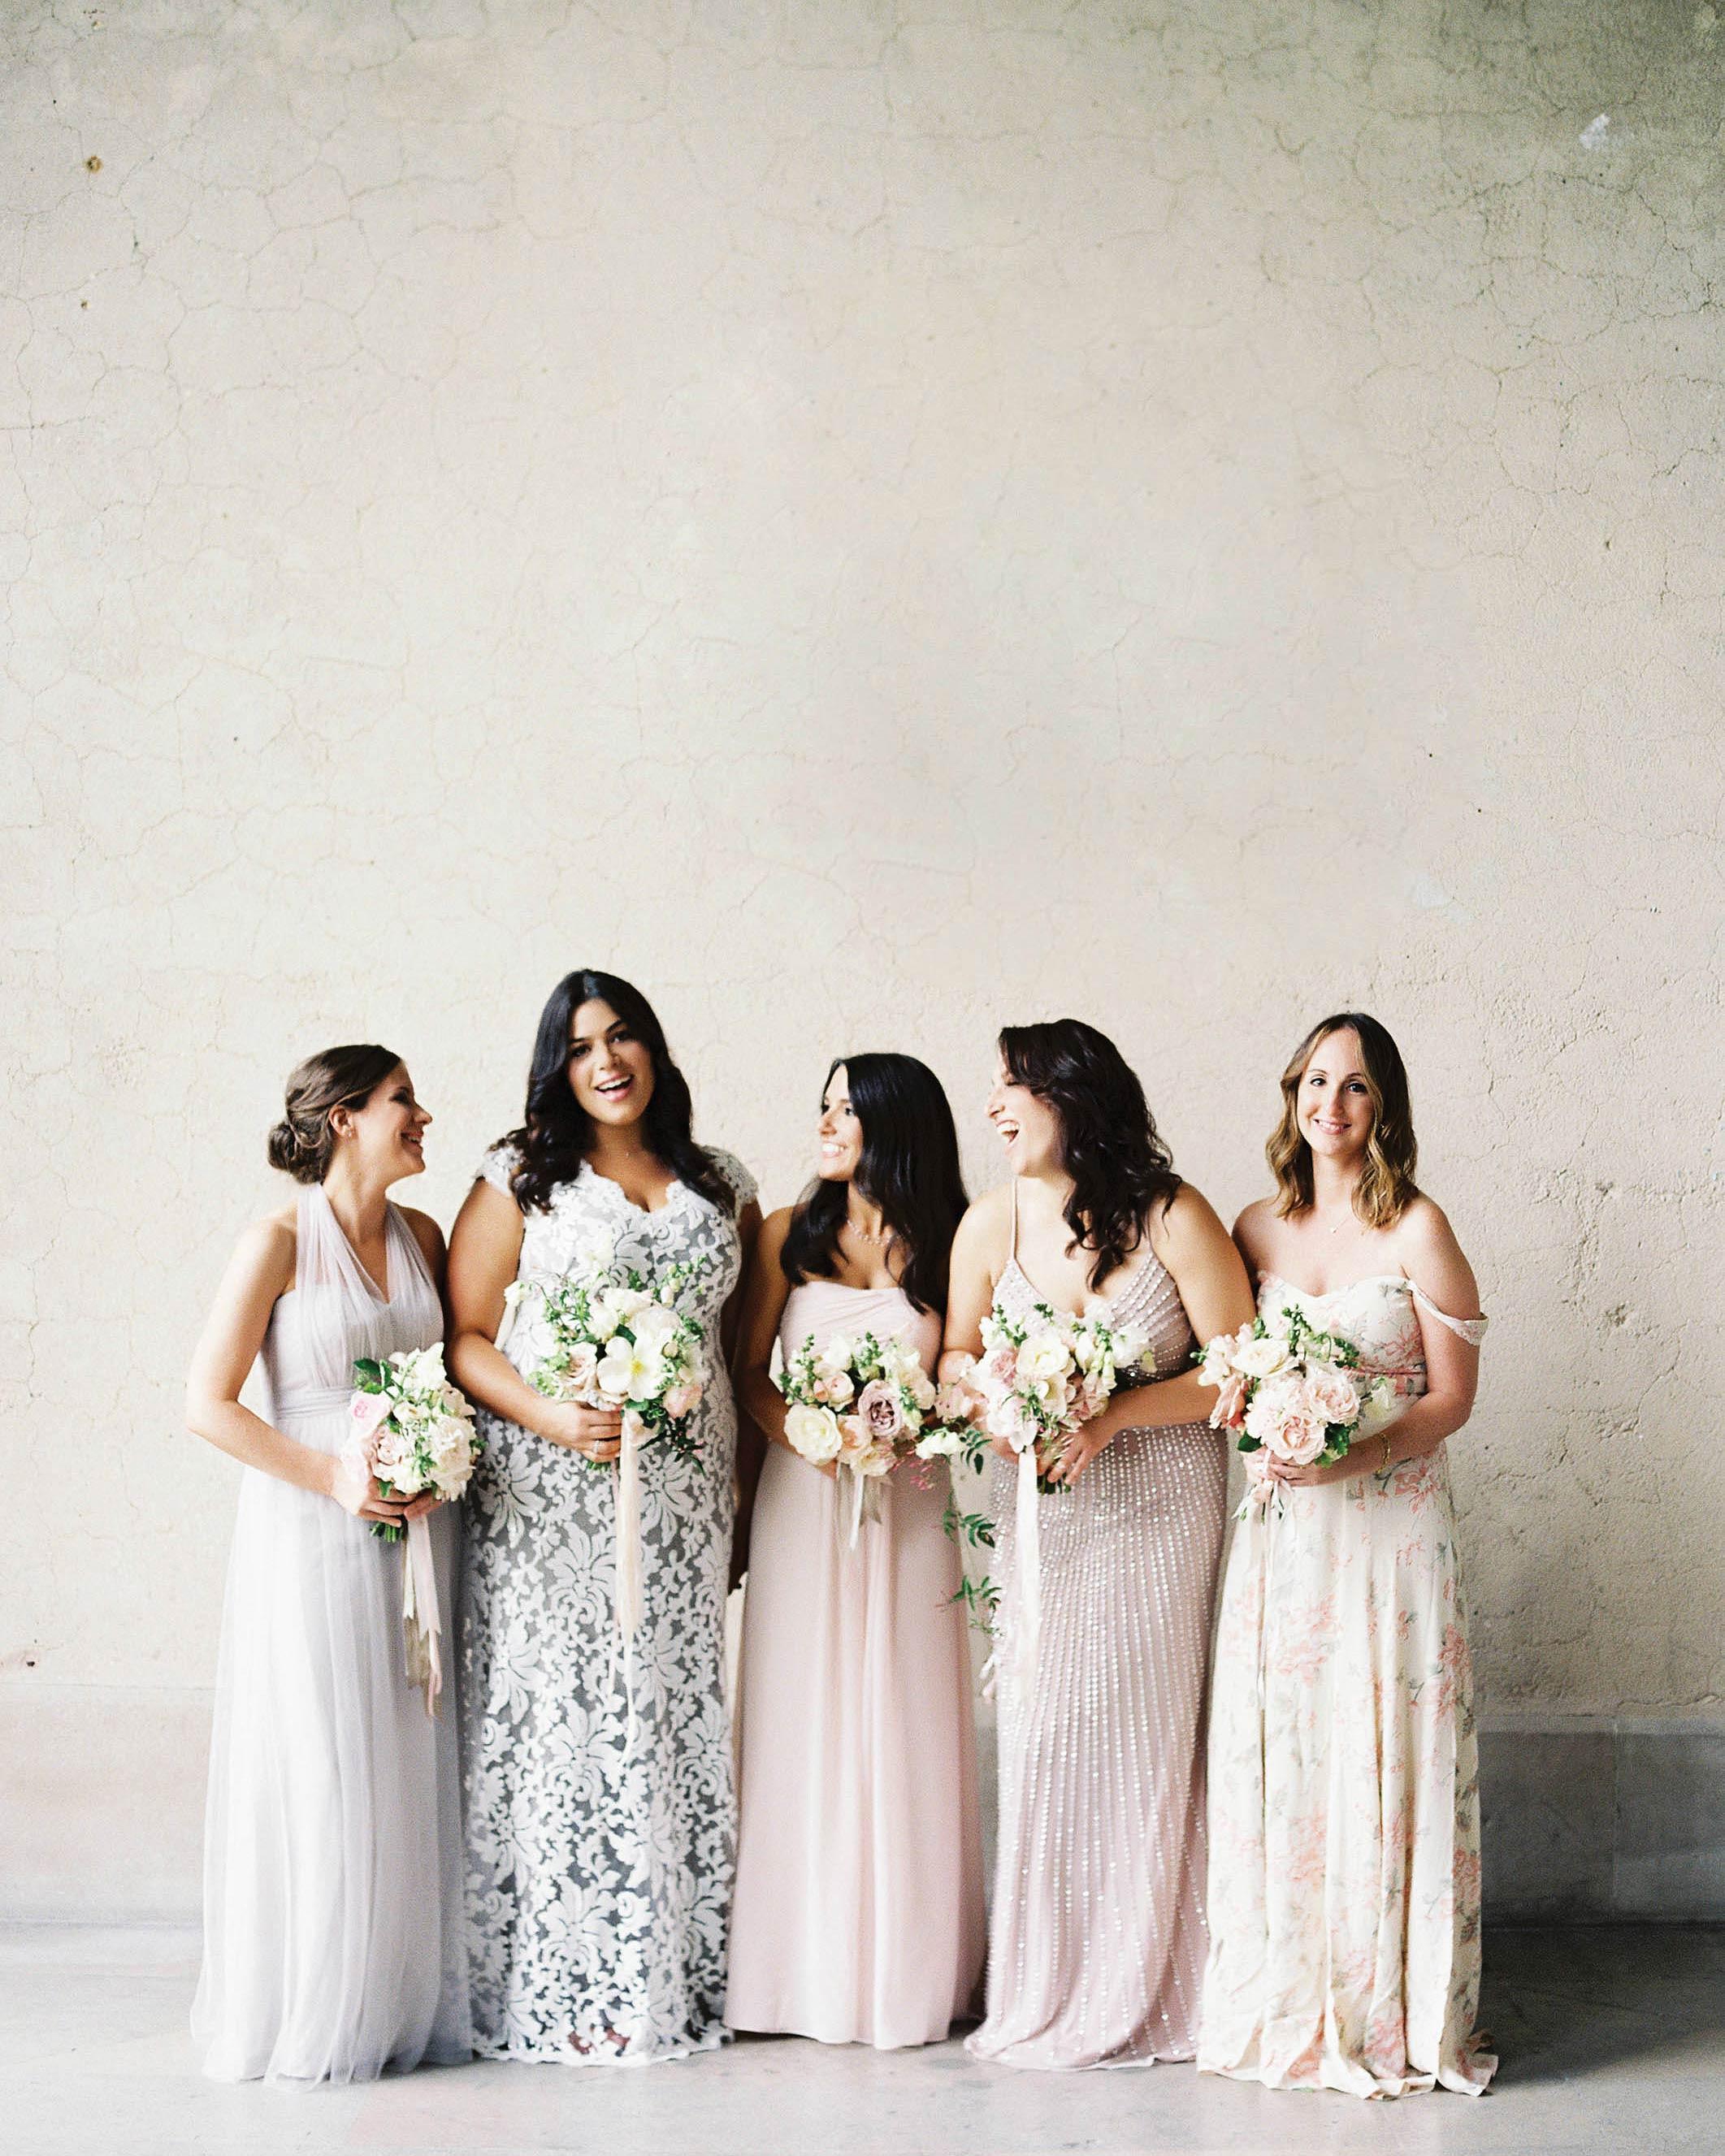 rebecca-david-wedding-new-york-candid-bridesmaids-169-d112241.jpg